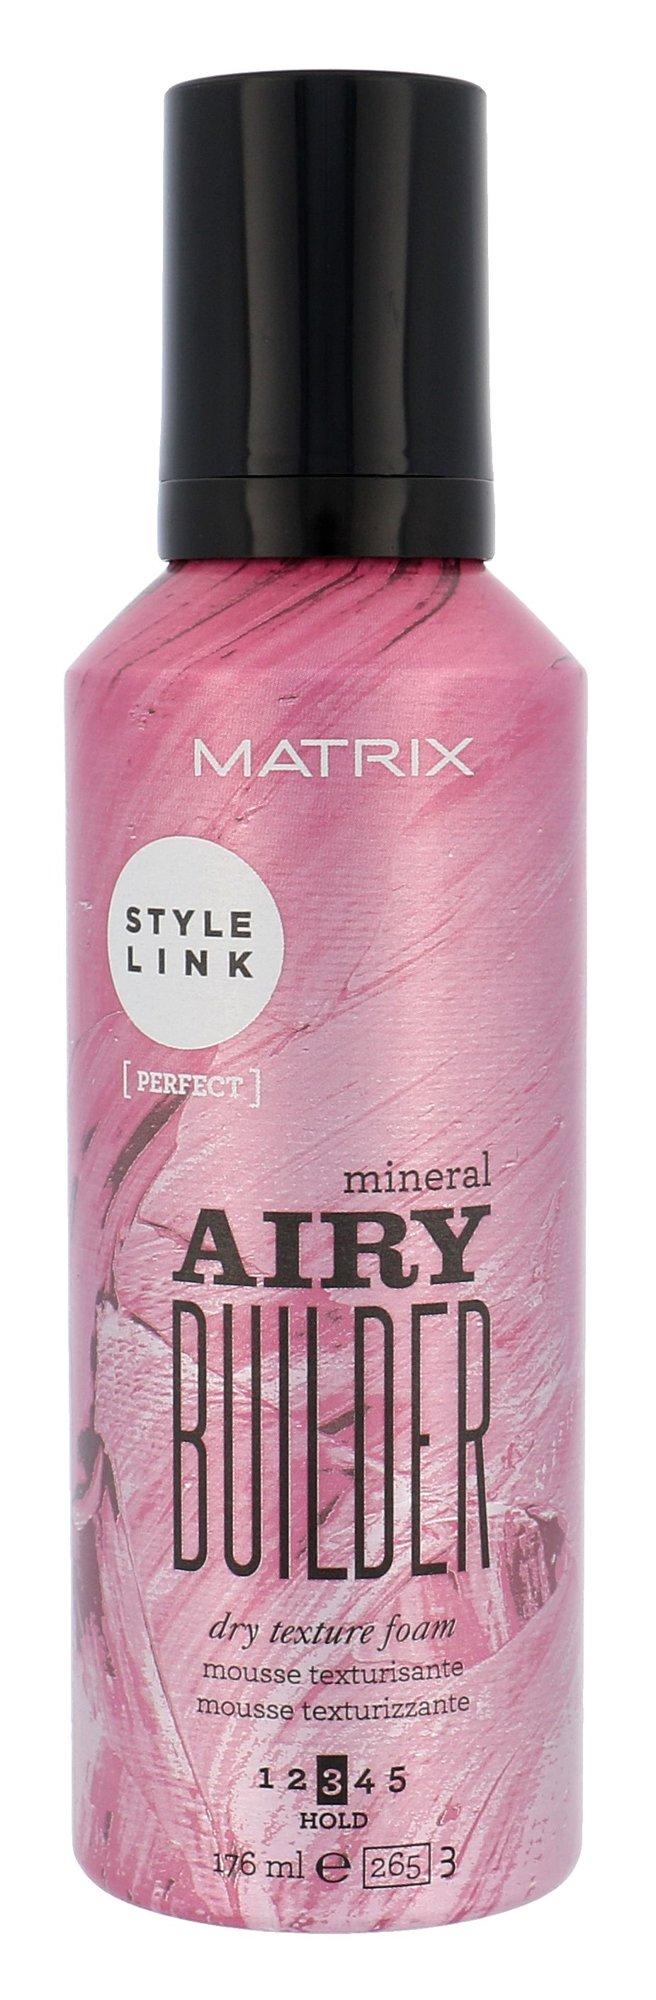 Matrix Style Link Cosmetic 176ml